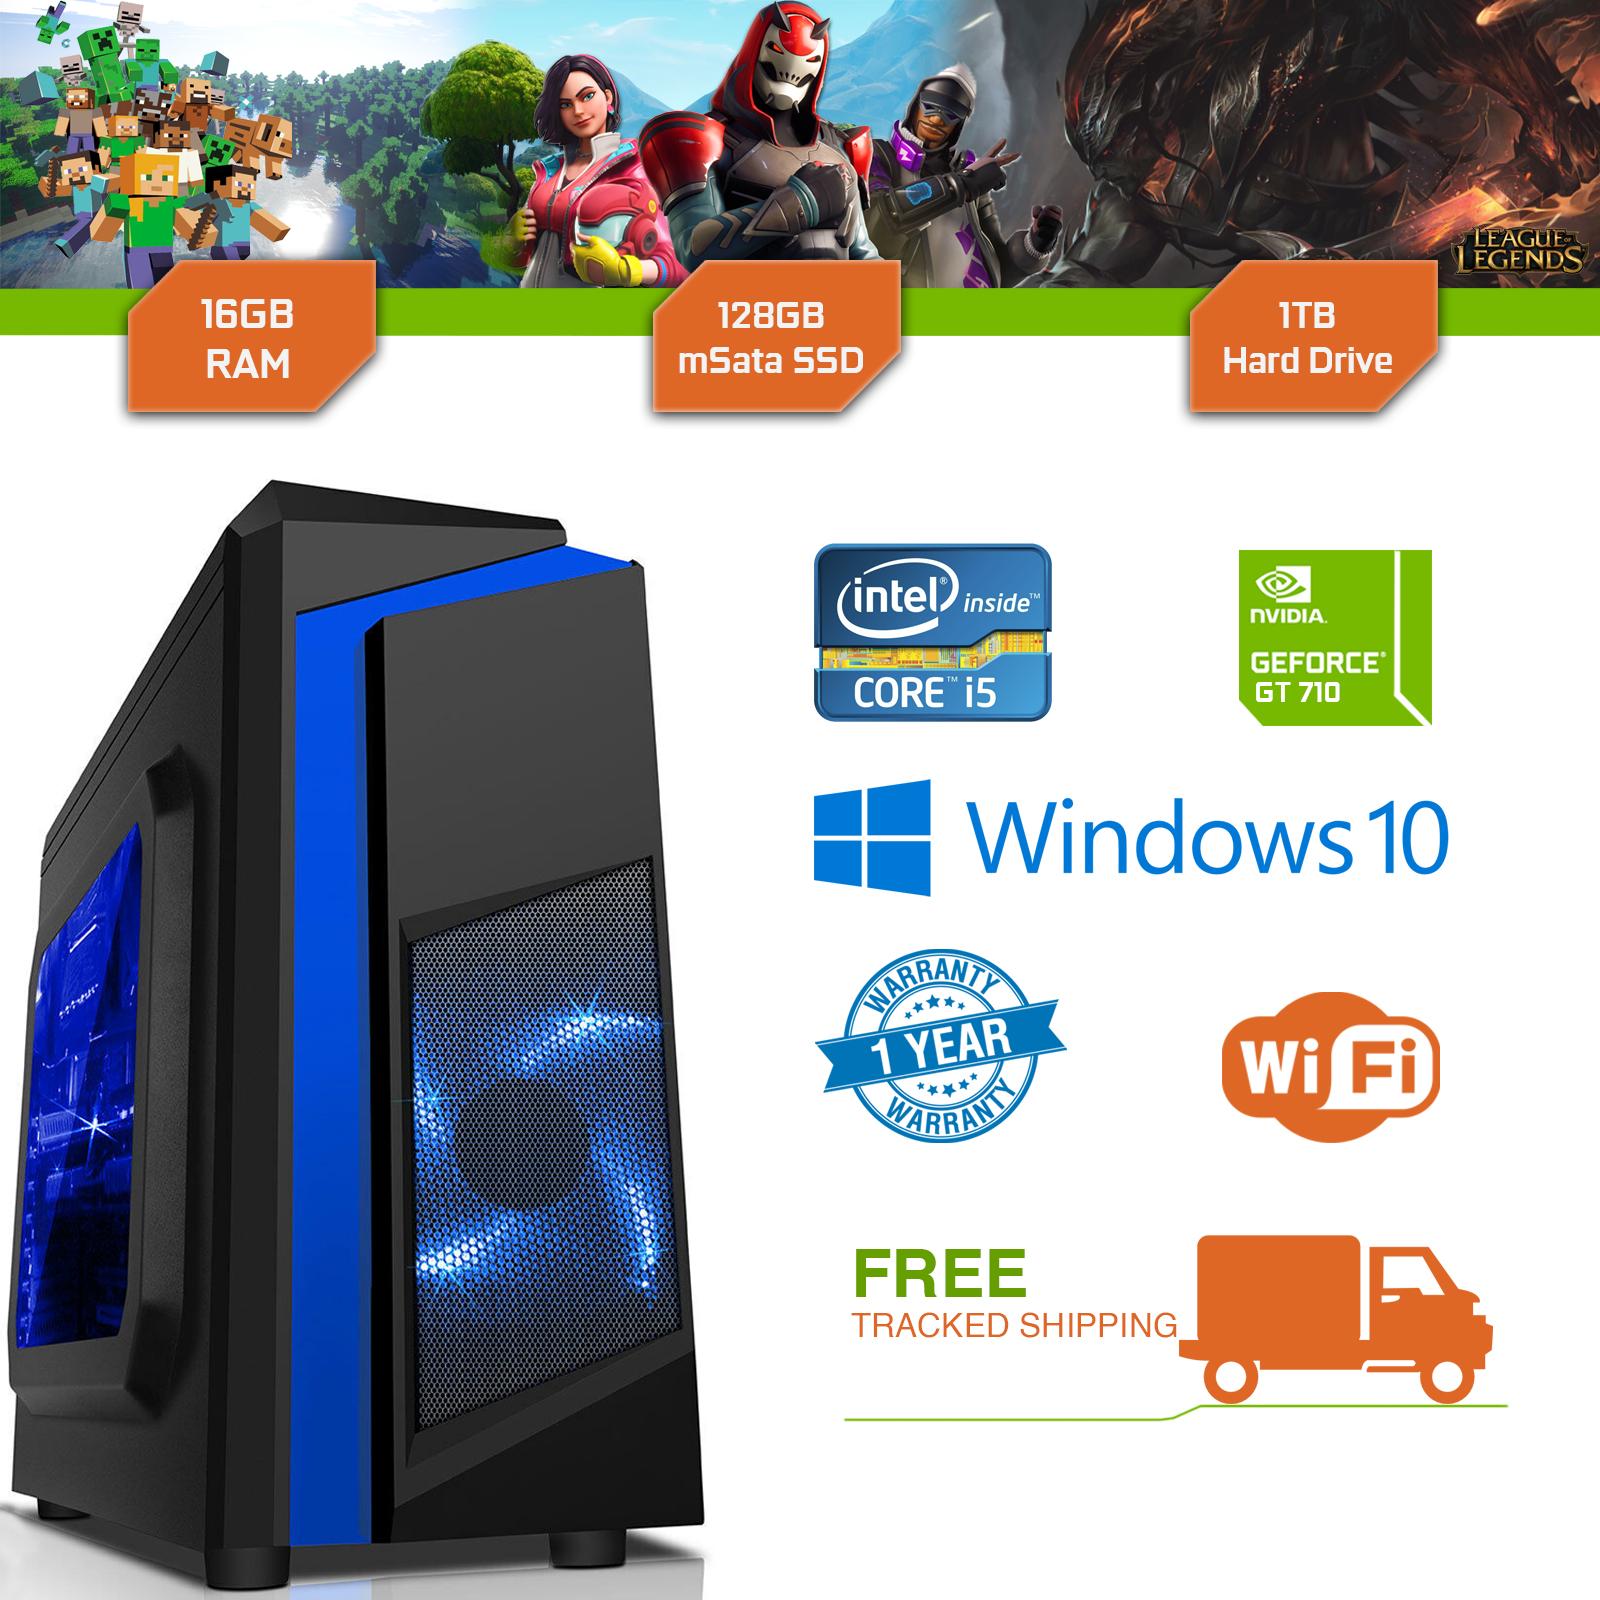 Cheap Gaming PC Intel Core i5 3.1GHz Windows 10 GT710 2GB 16GB RAM 128GB SSD 1TB